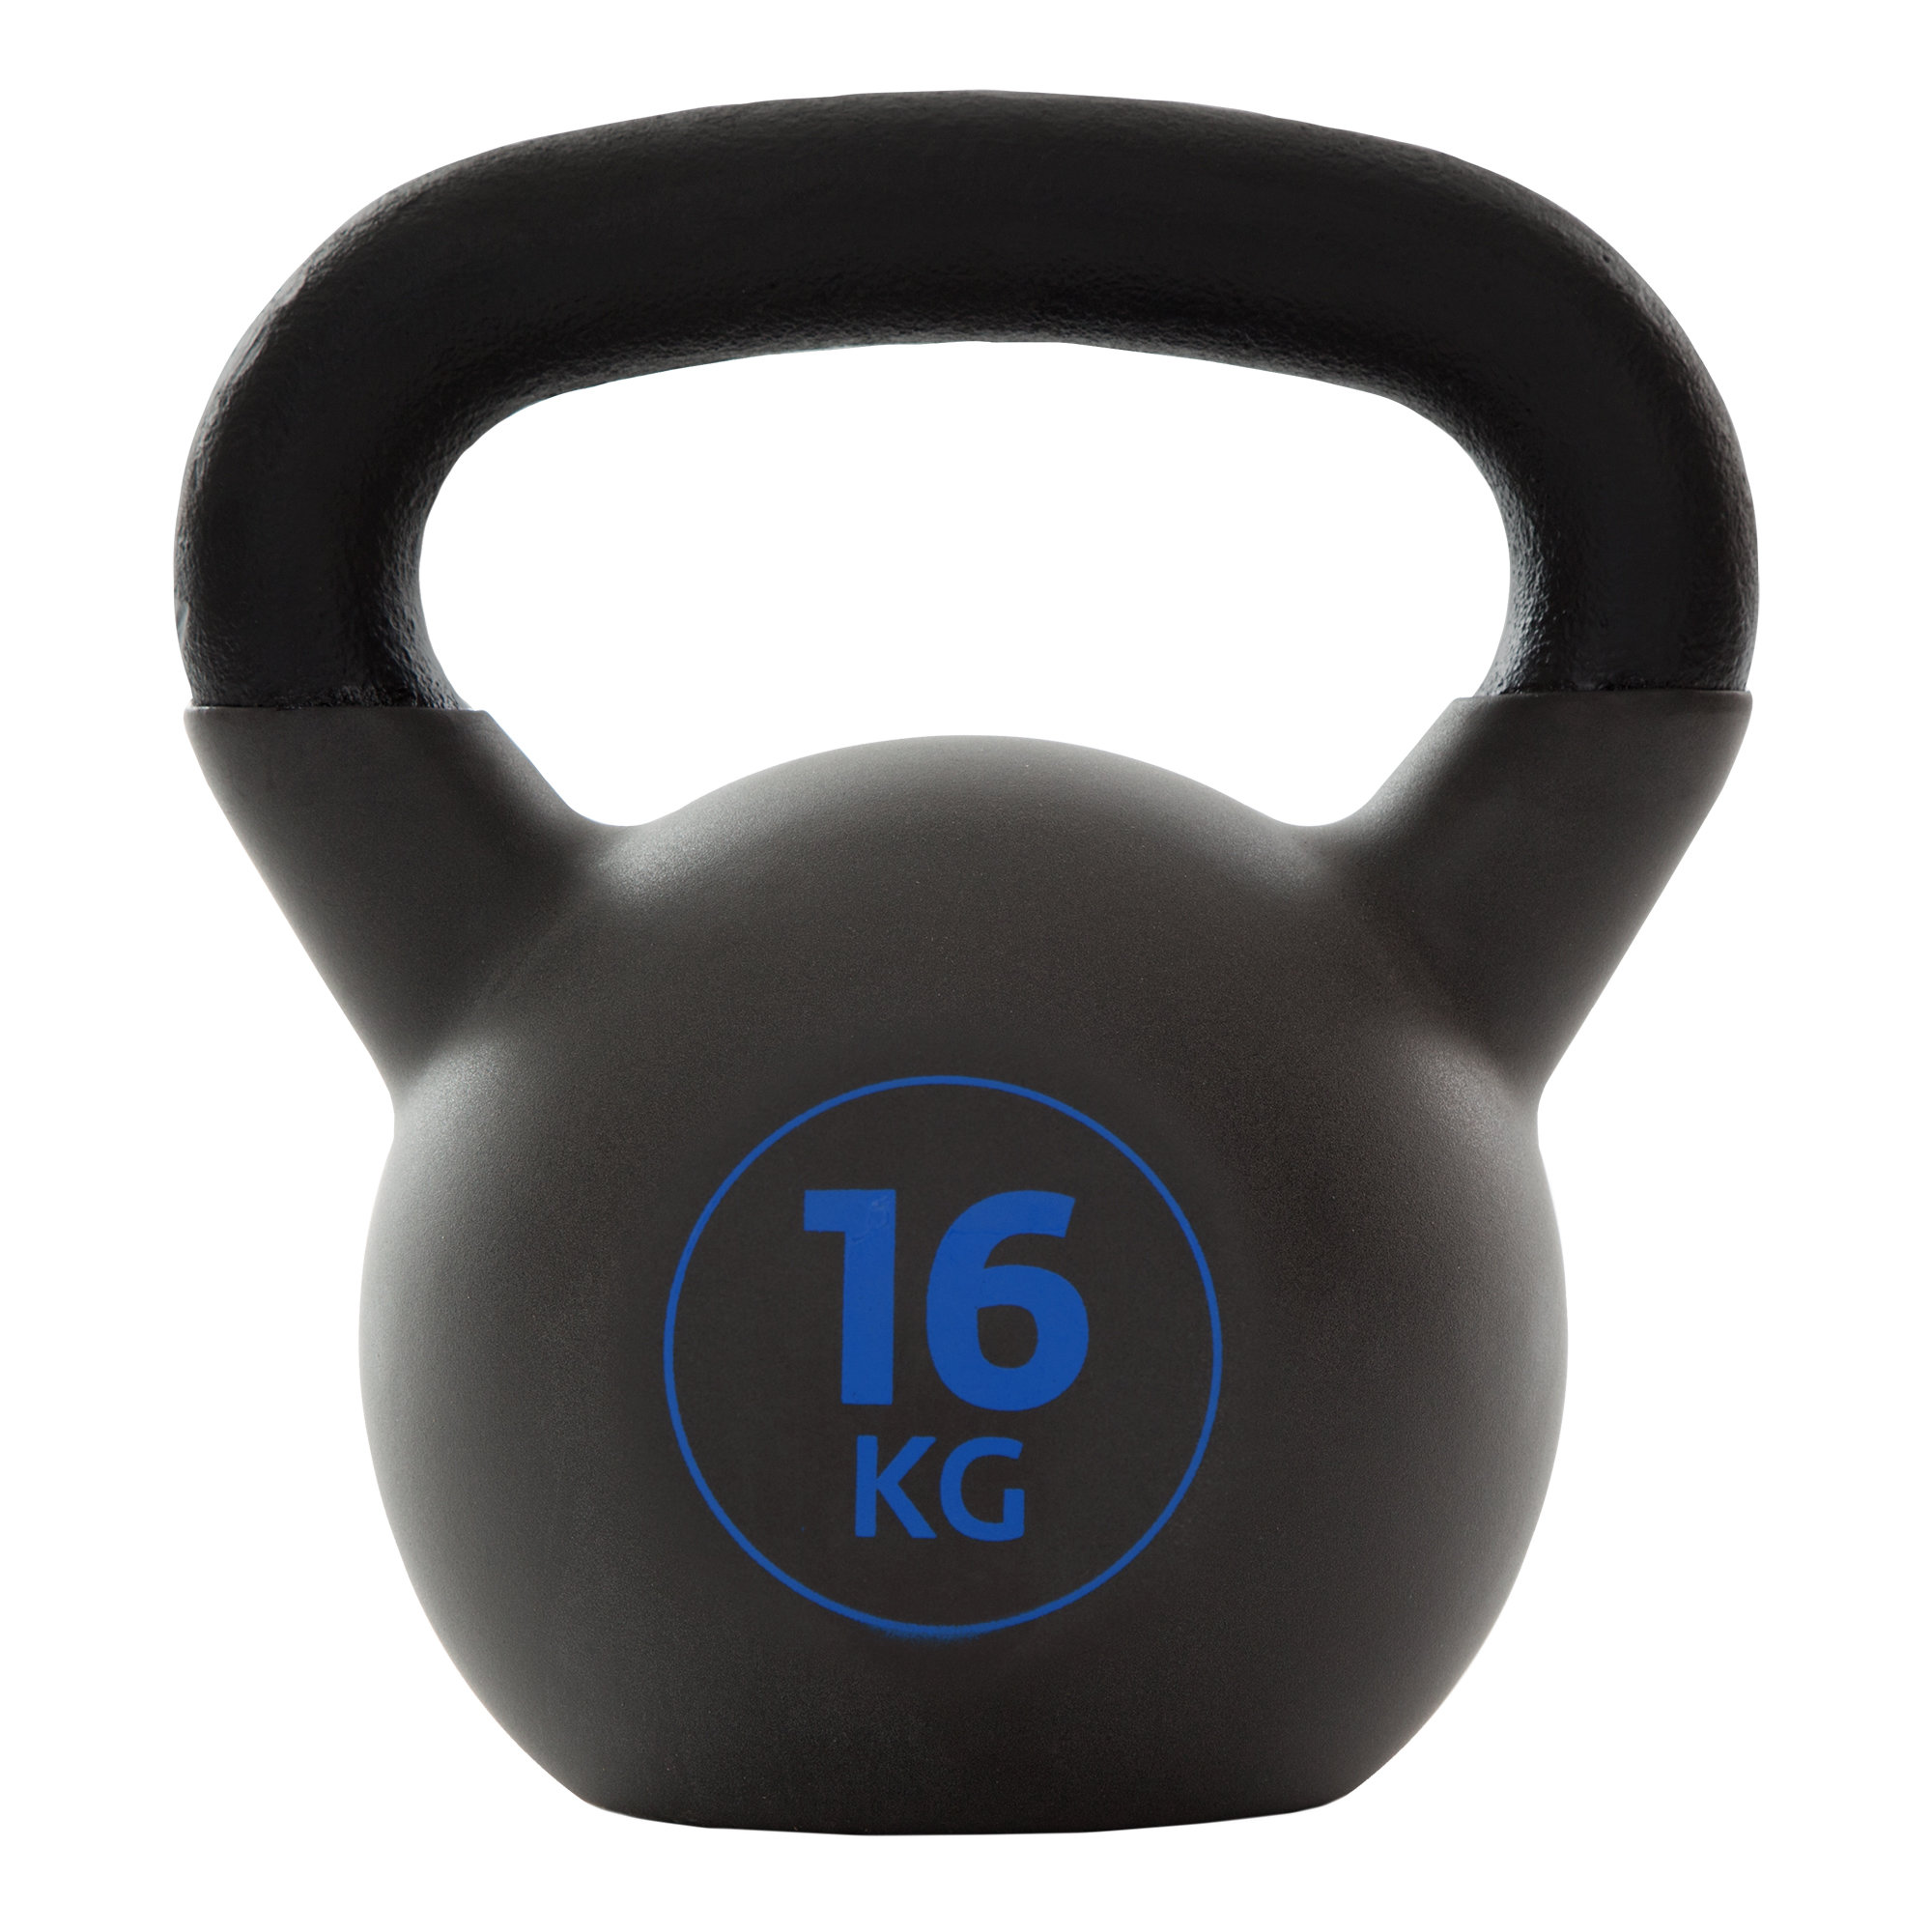 Torneo Гиря, 16 кг 1026-160